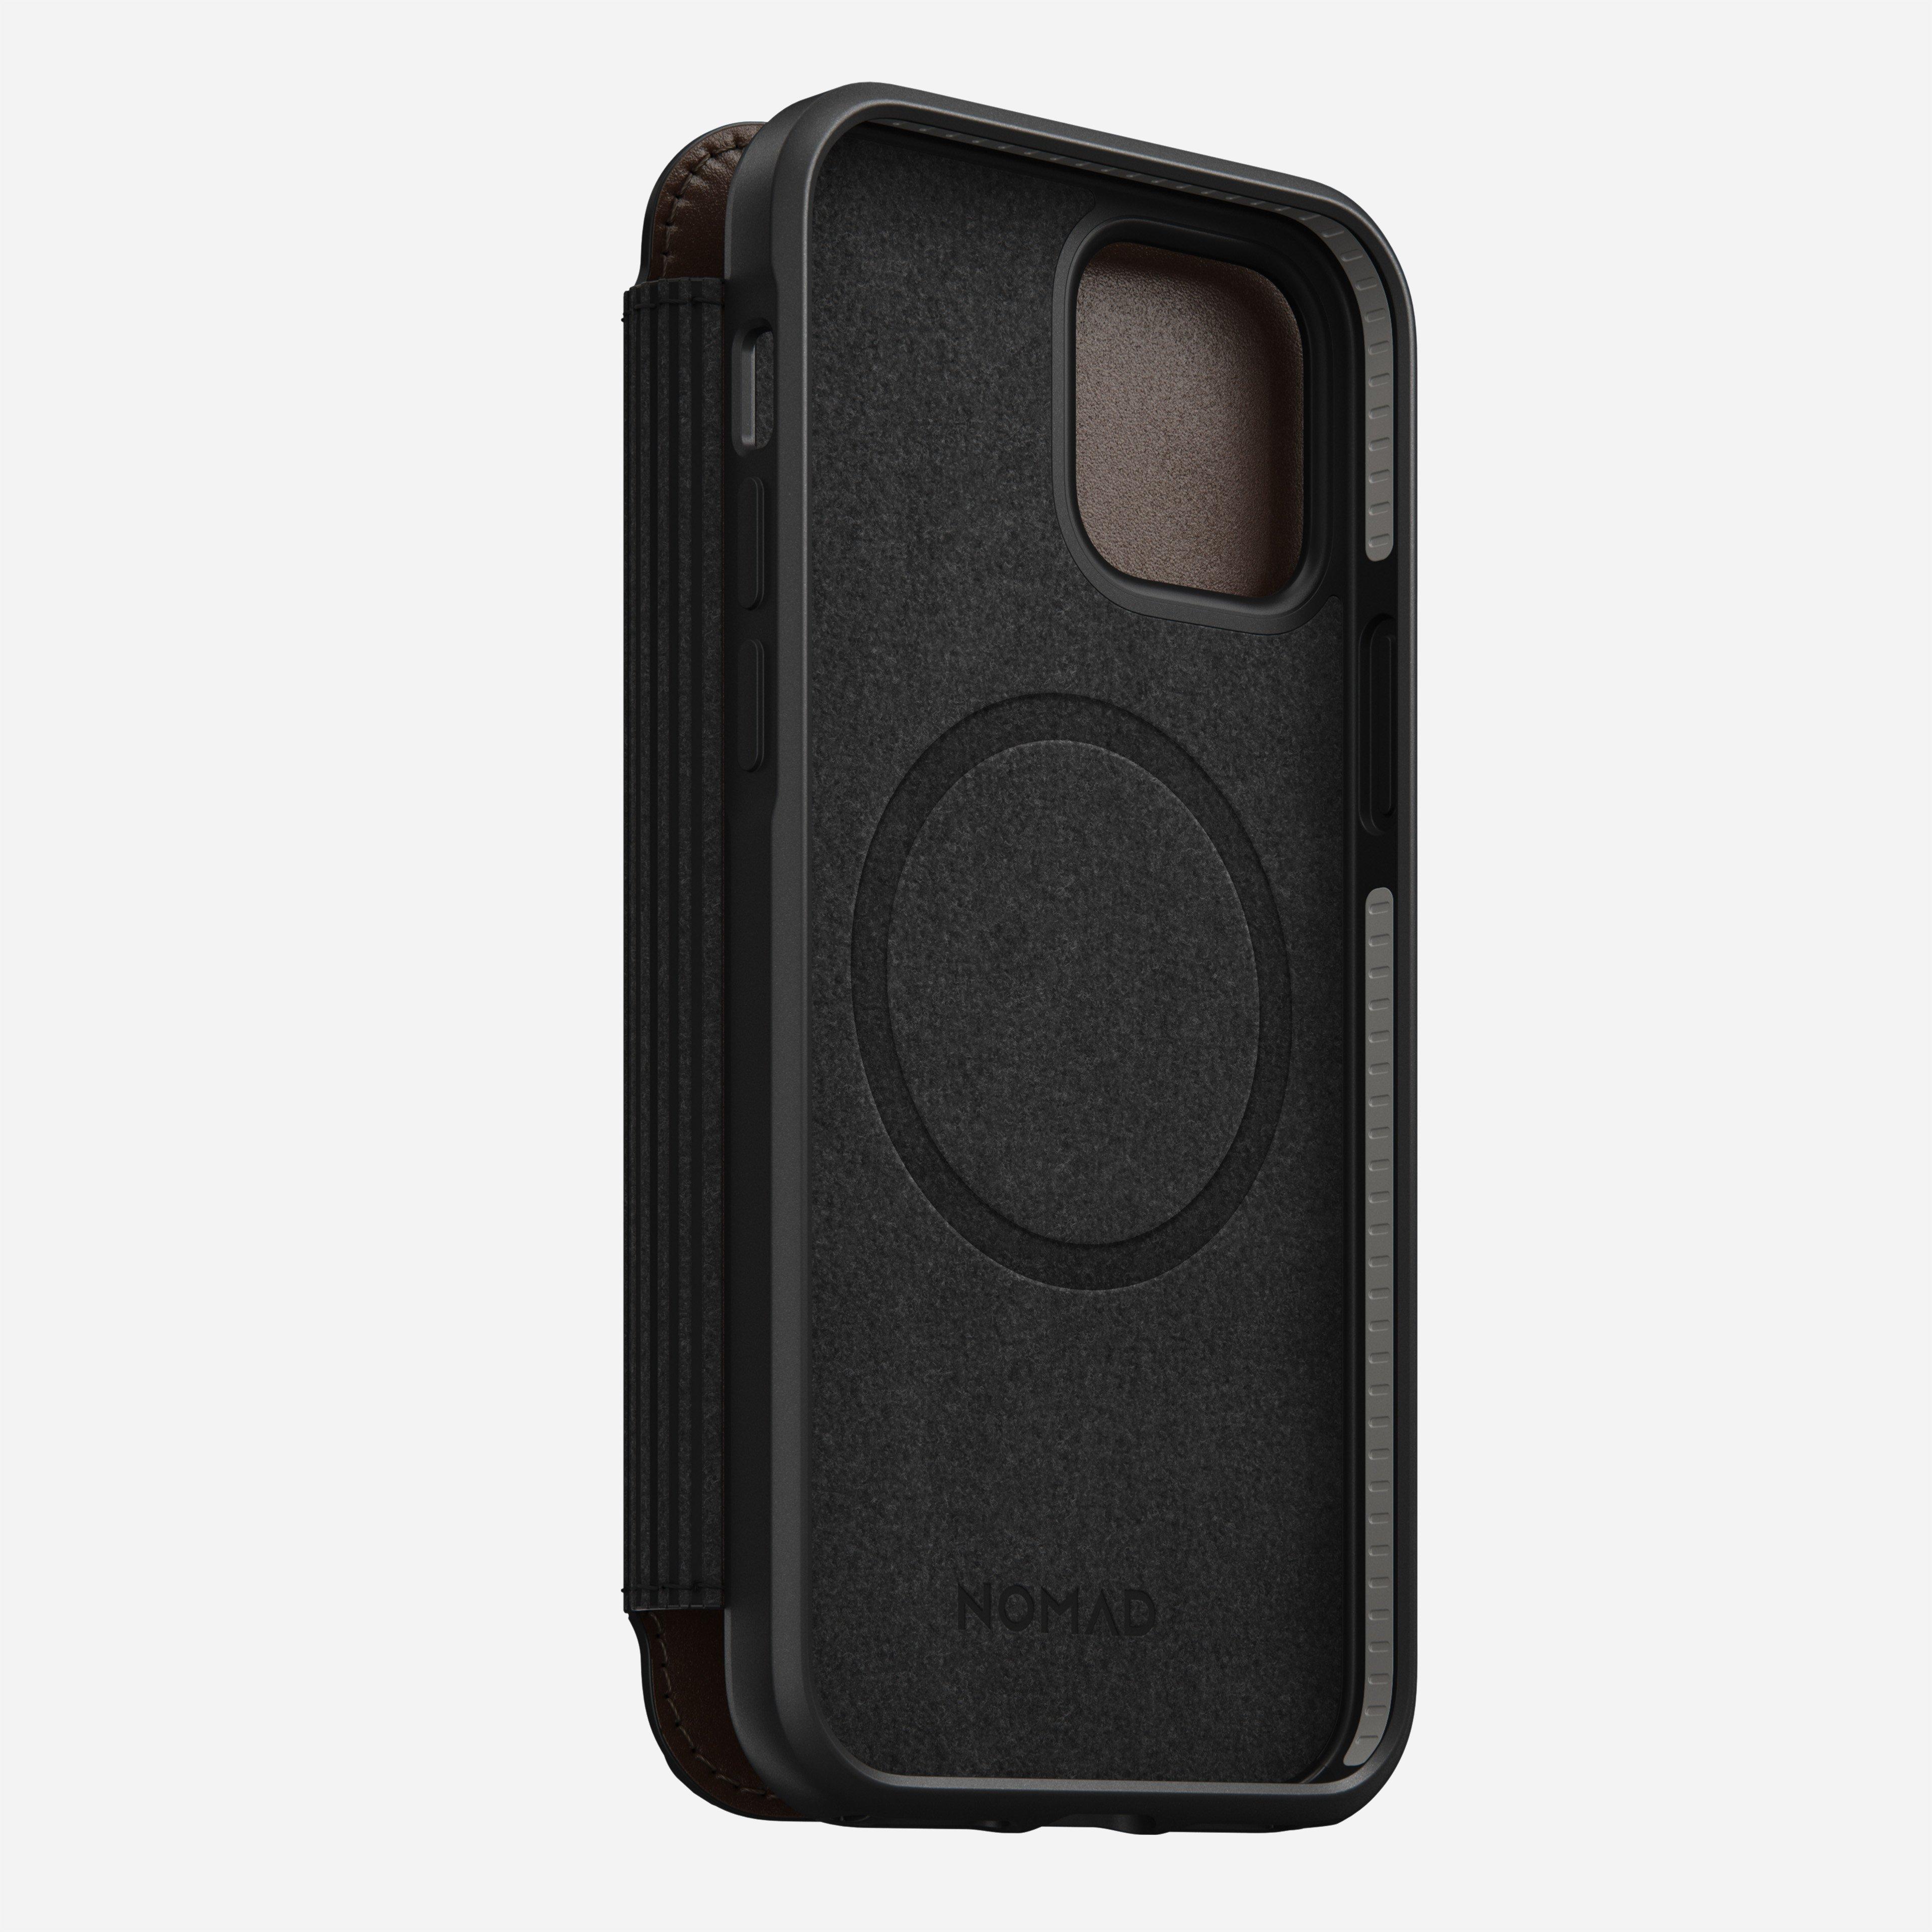 Rugged folio magsafe horween leather black iphone 12 pro